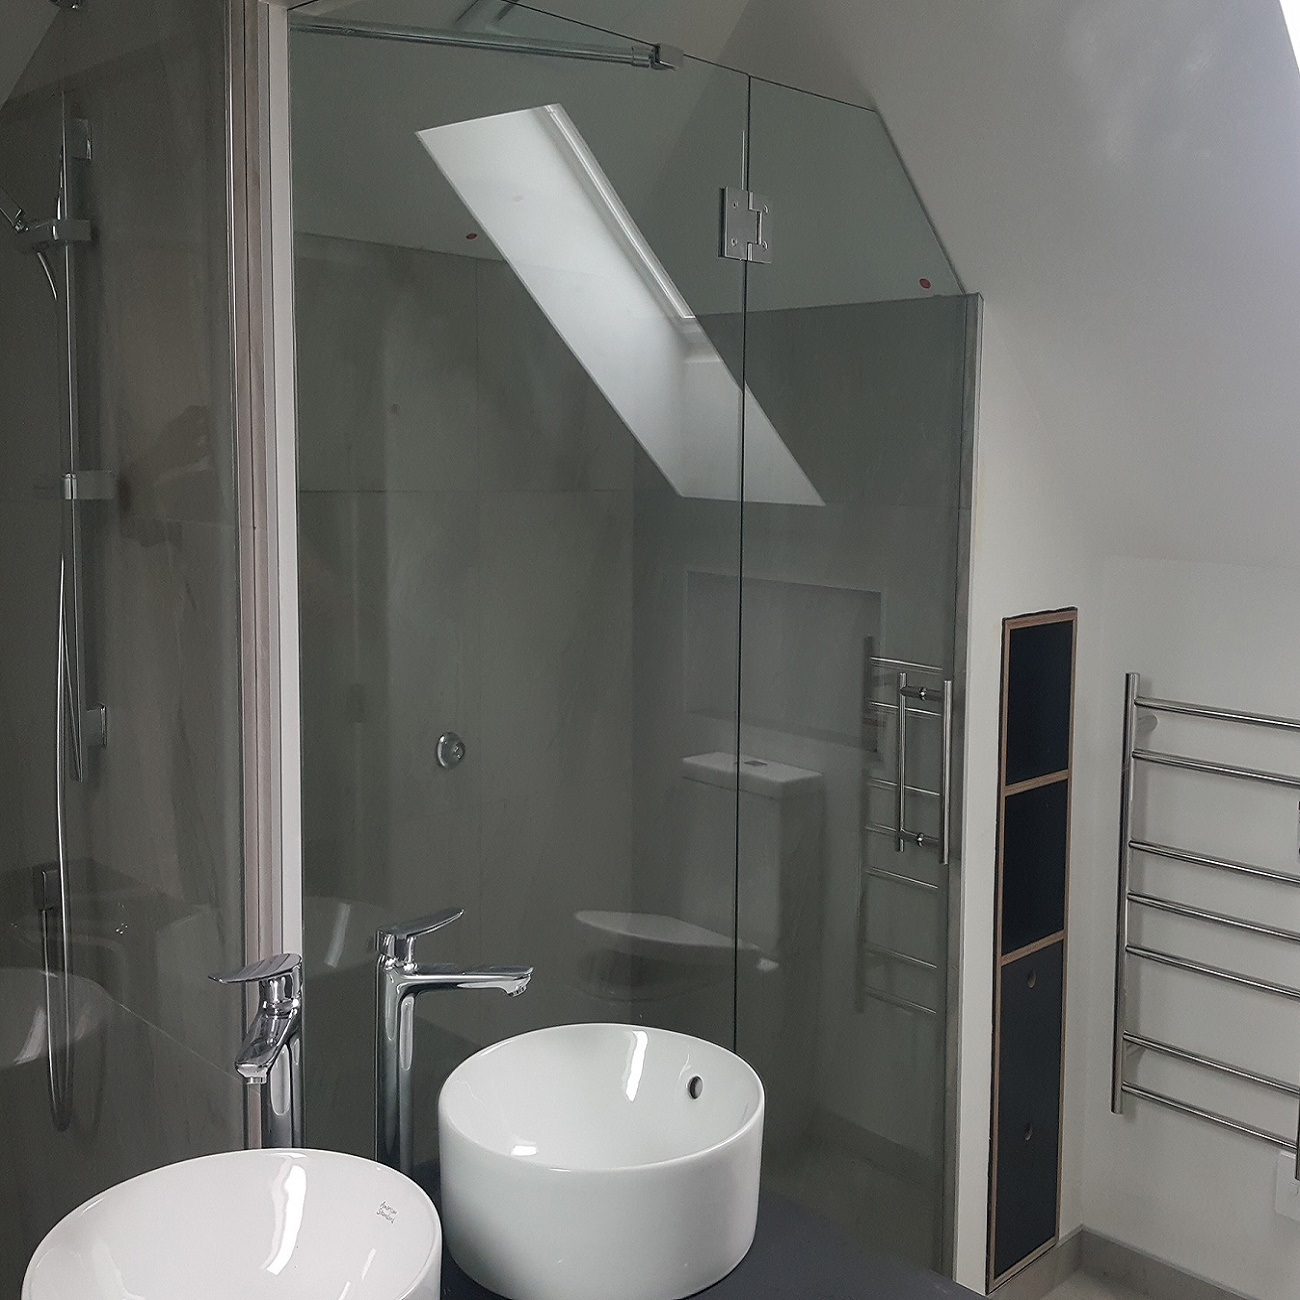 Hot Item Hotel Villa Use Stainless Steel Hardware Frameless Glass Bathroom Shower Door Shower Screen